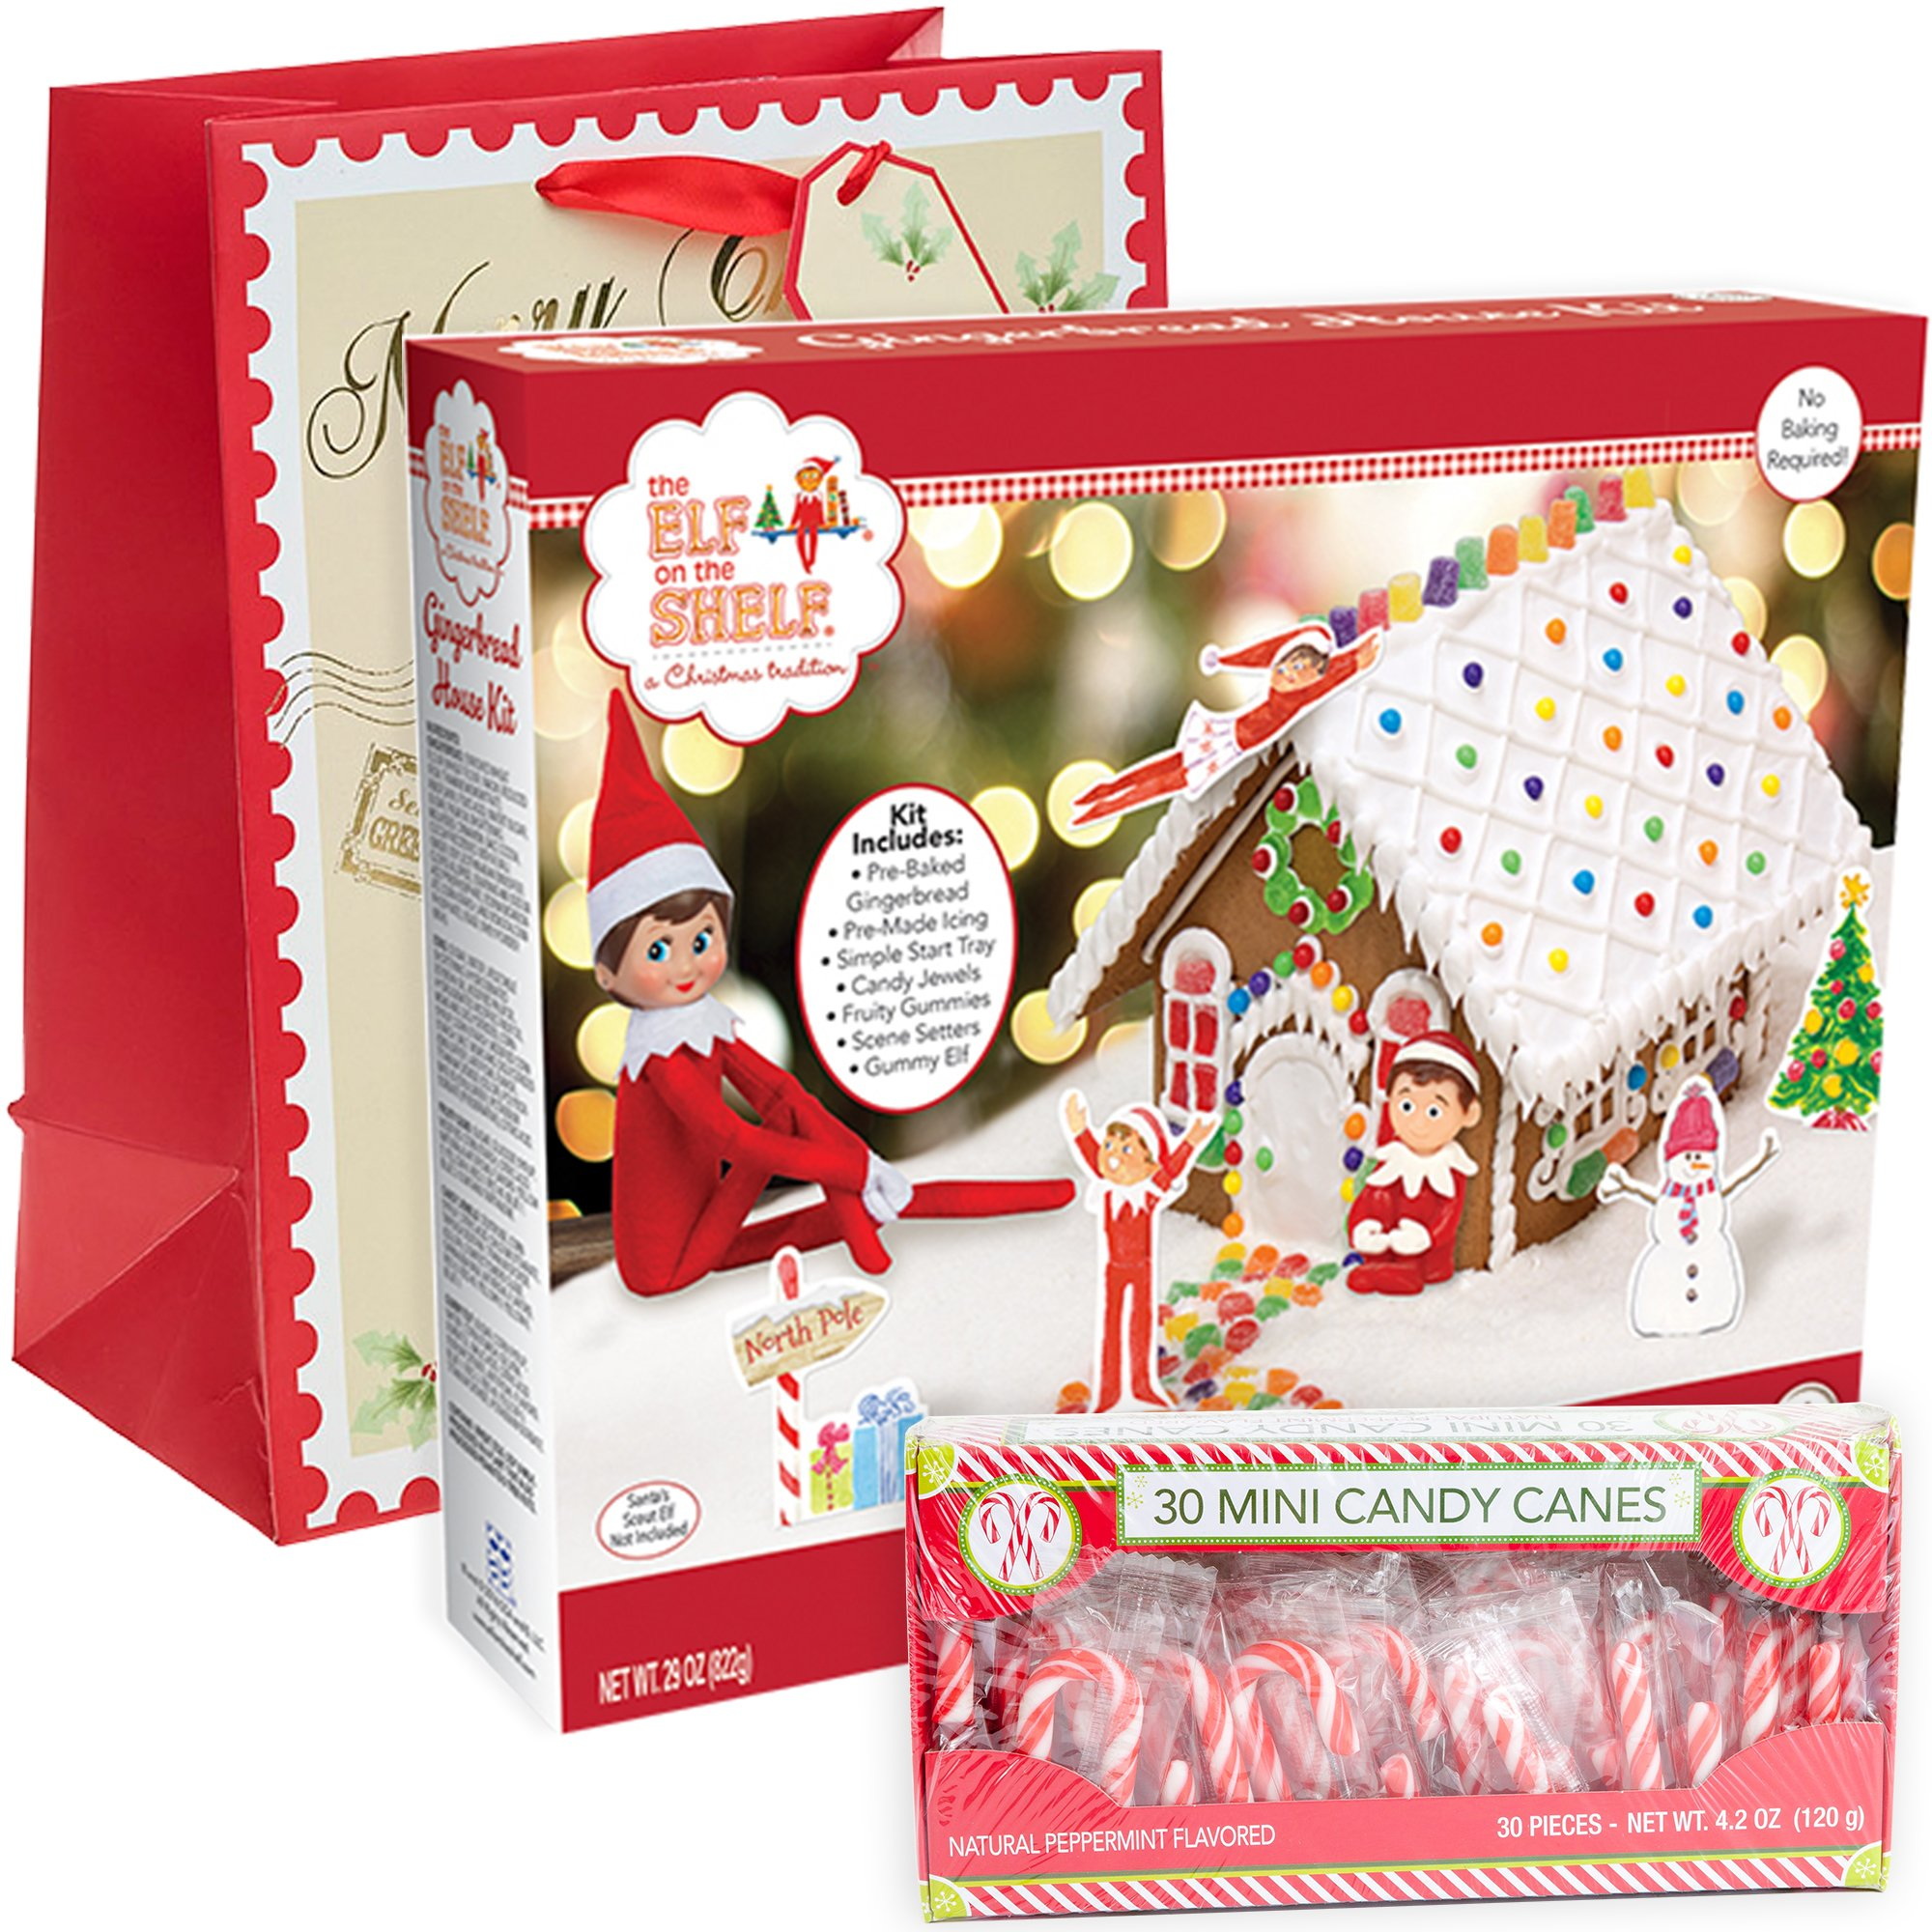 Amazon Elf on the Shelf Gingerbread House Kit Pre baked Pack